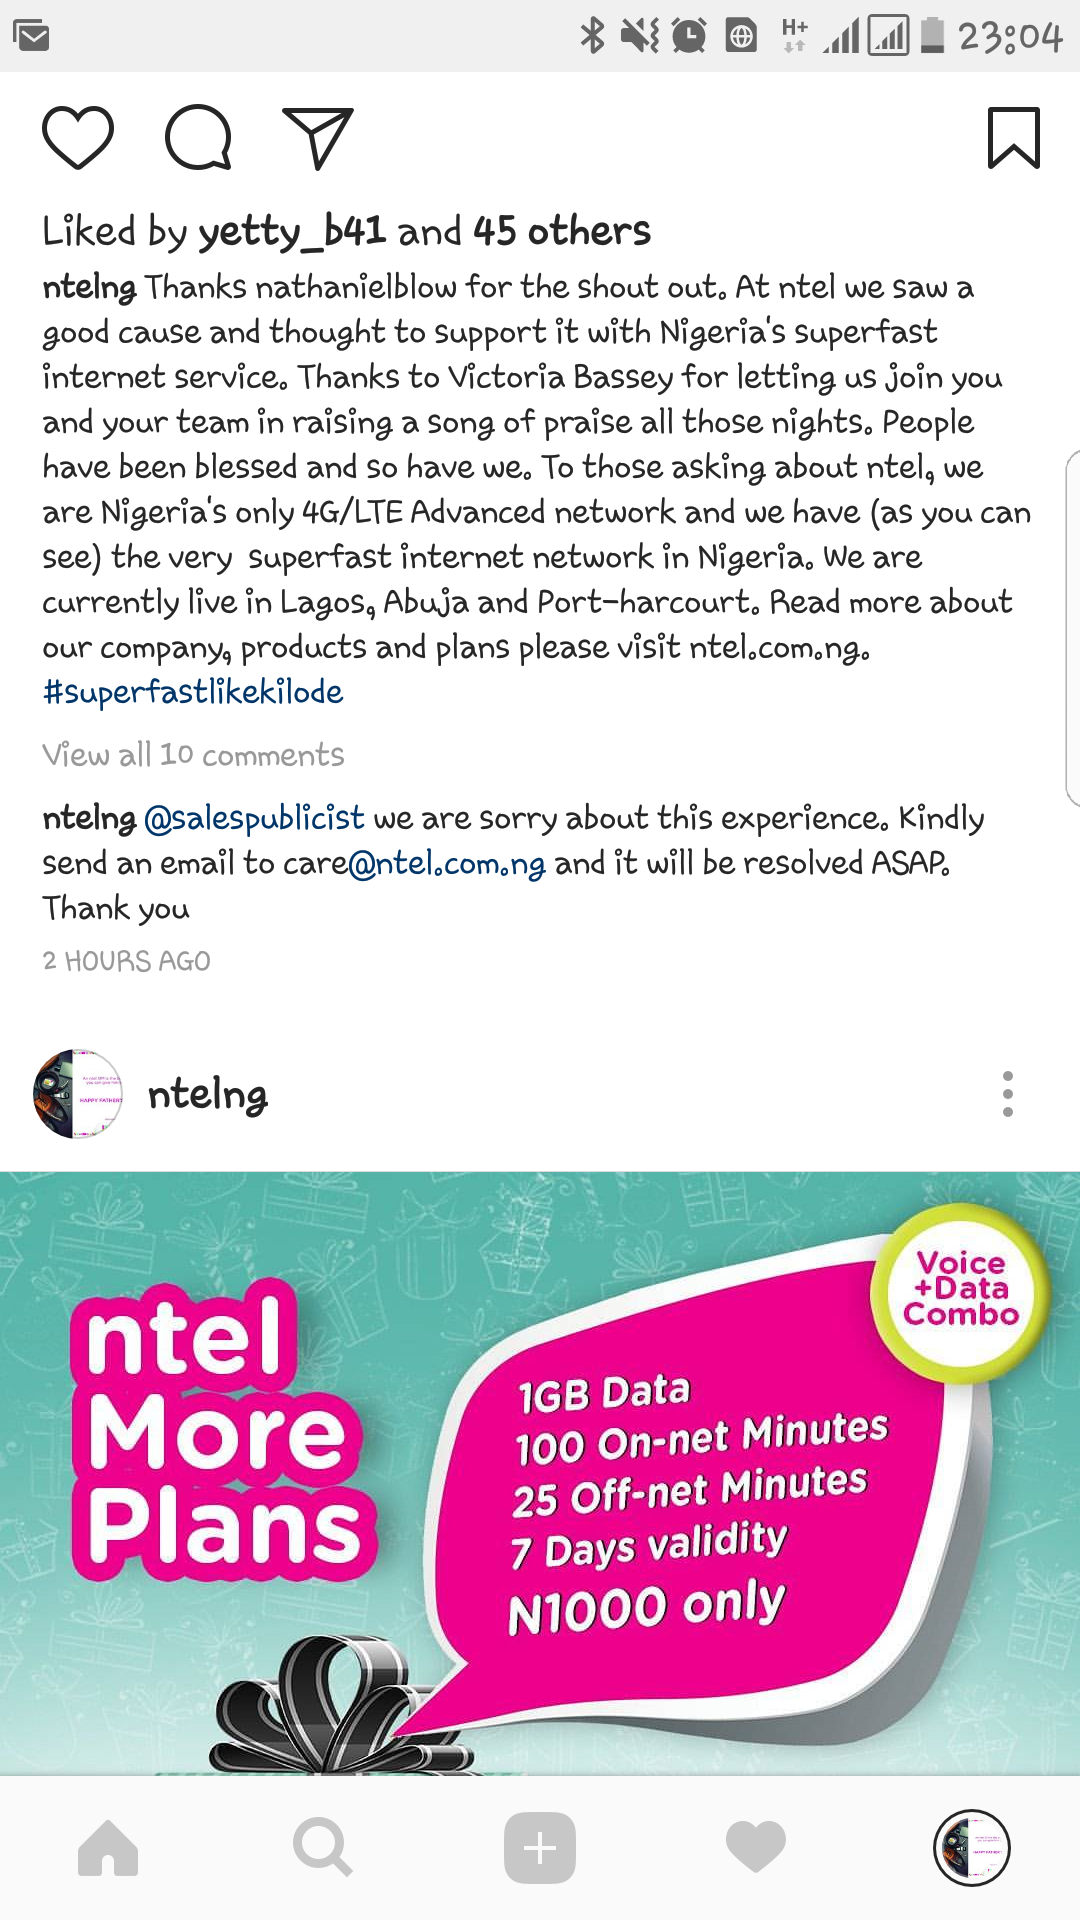 ntel Gets Huge EndorsementOver #halleluyahchallenge